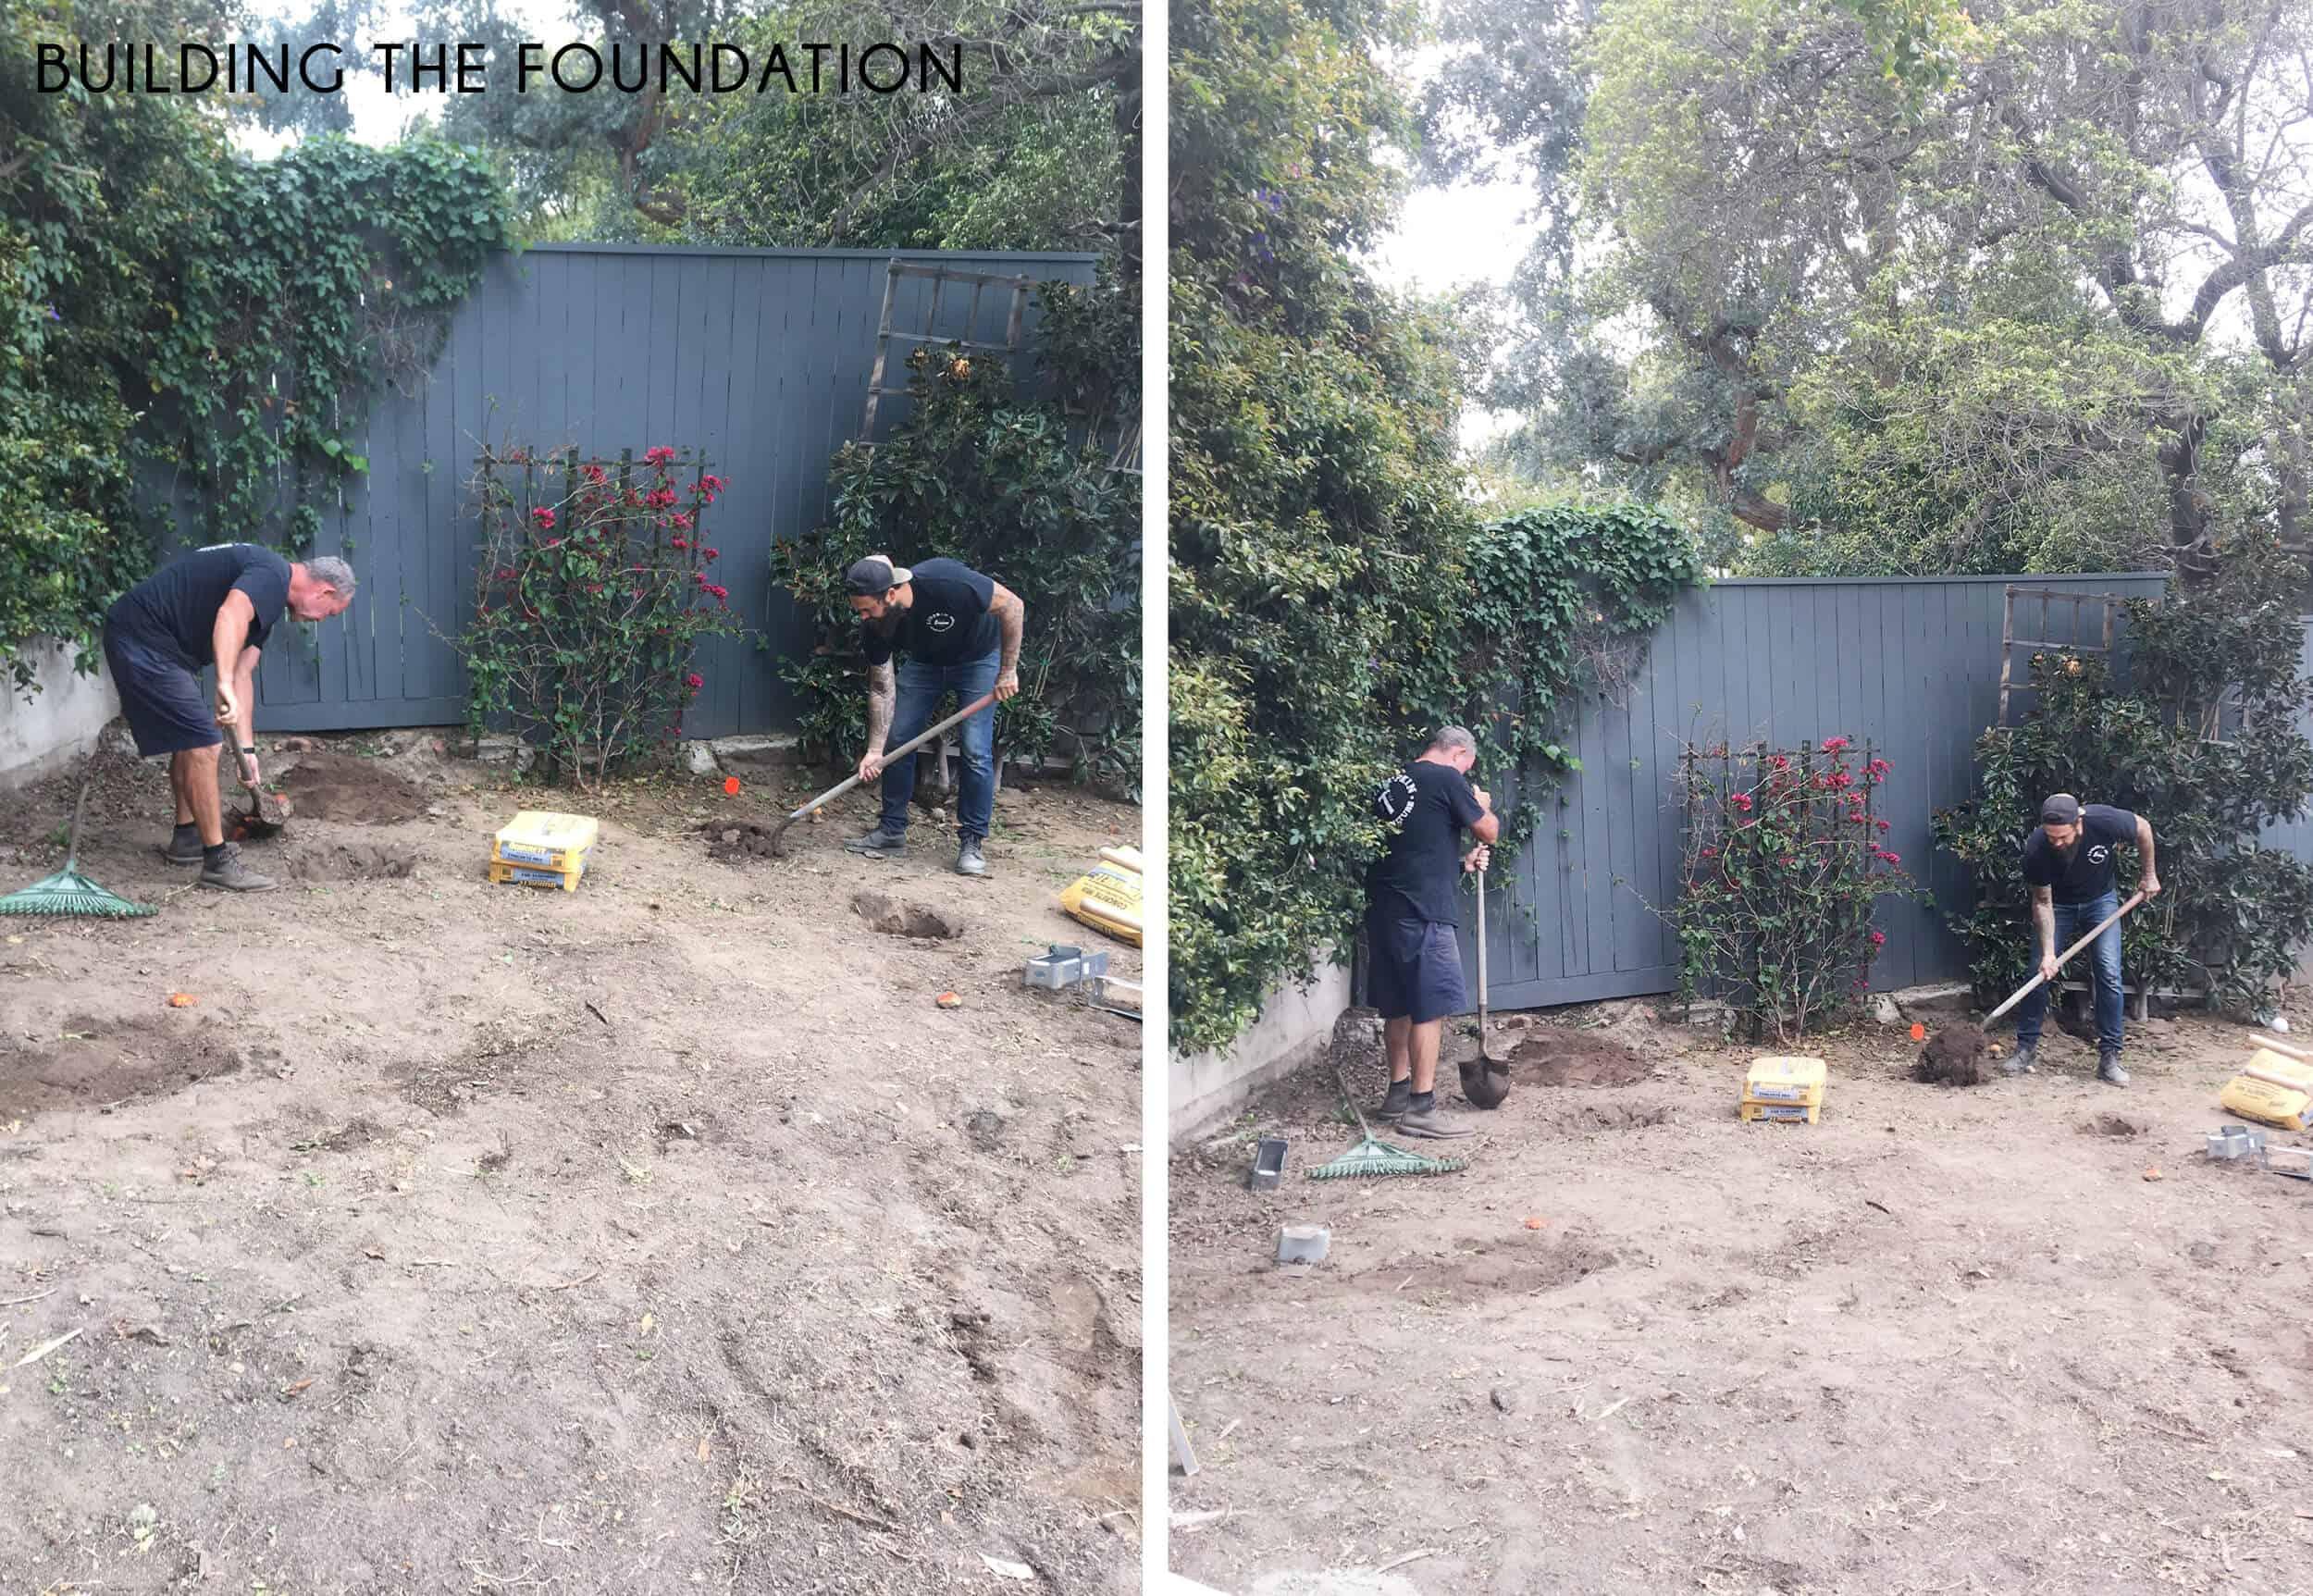 Emily-Henderson_Waverly_Backyard_Playfort_Castle_Building-the-Foundation